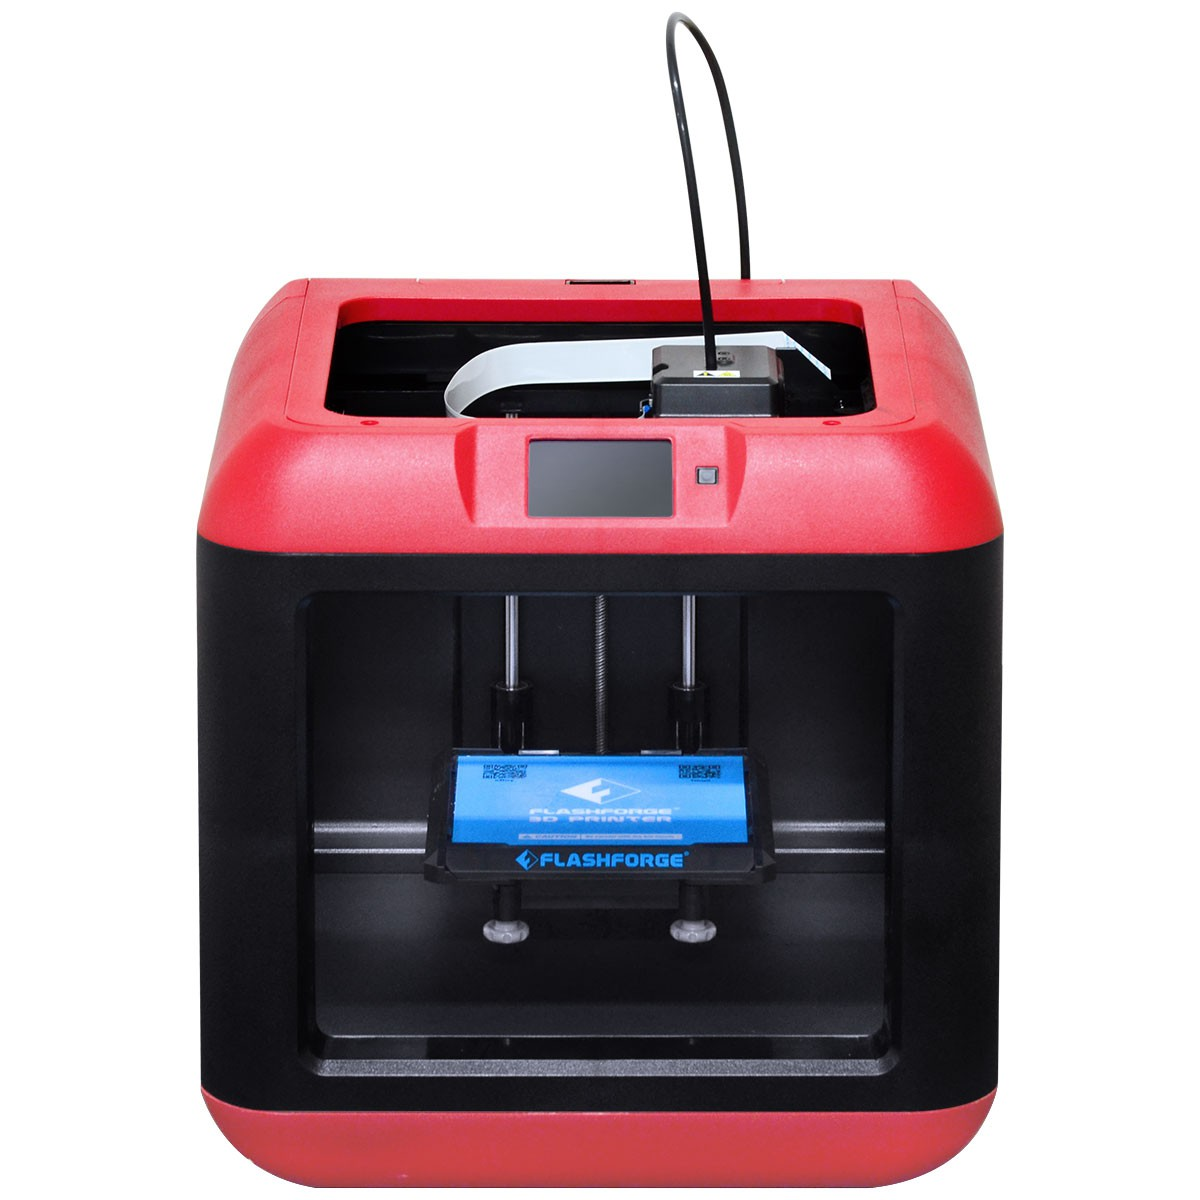 Impressora 3D Finder 140X140X140MM 1 Extrusora Plataforma Removível Wifi Nivelamento Auxiliado